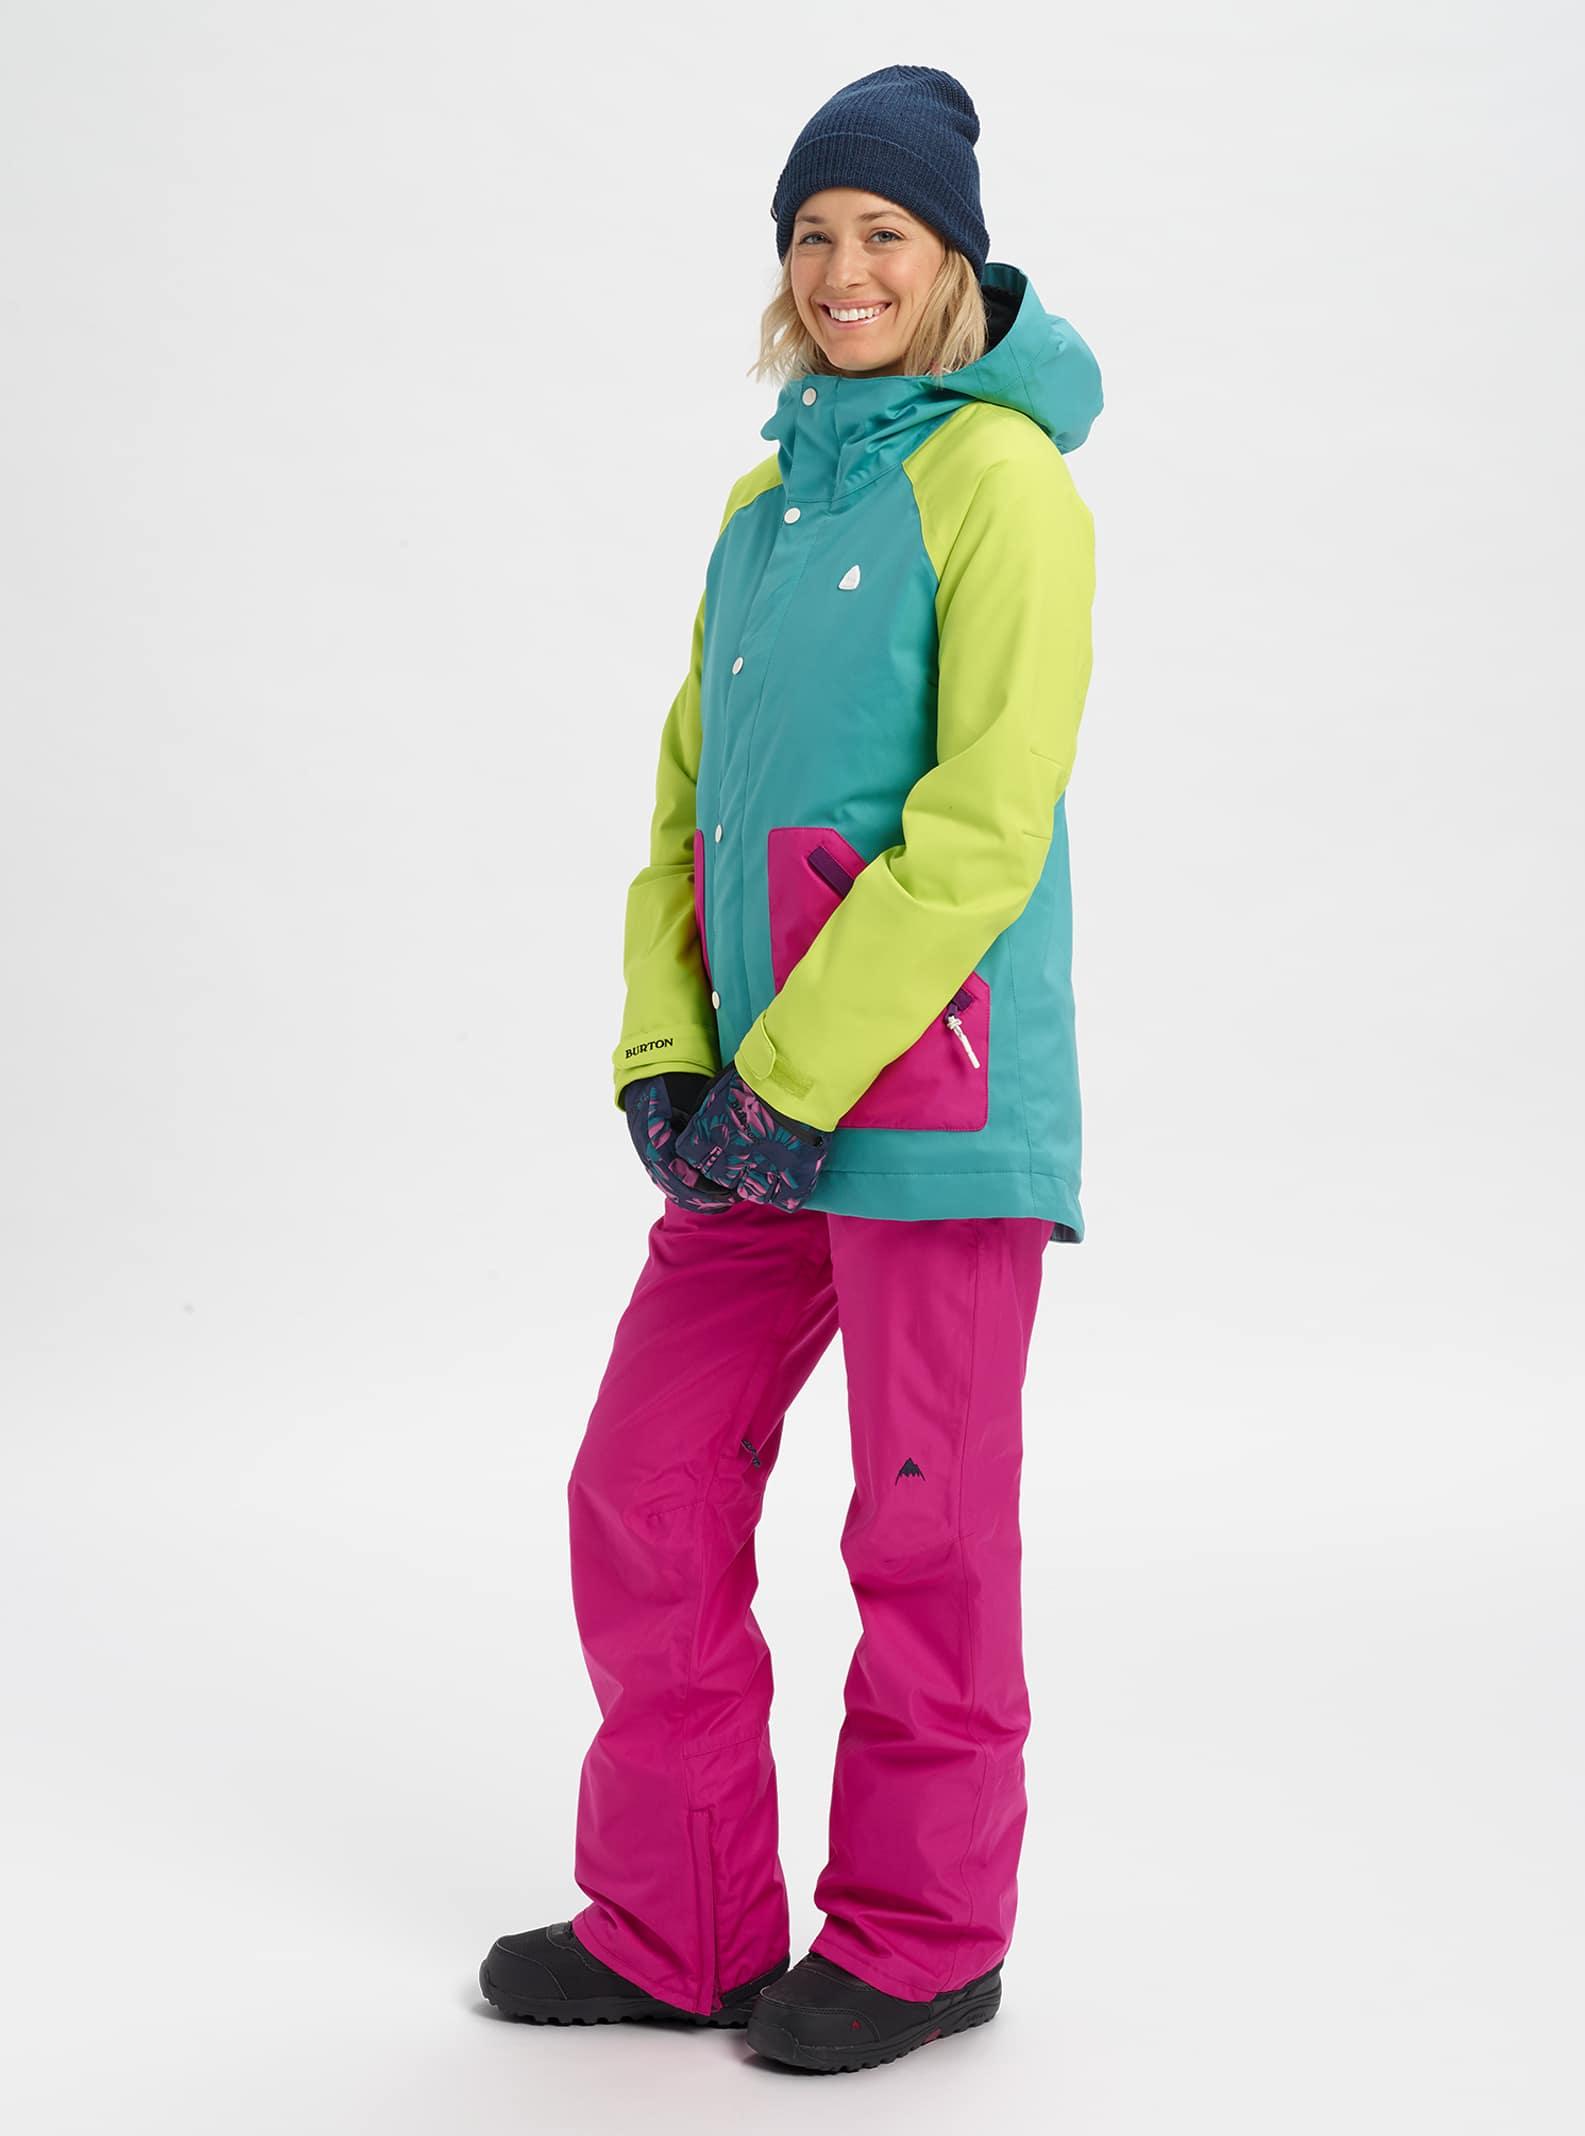 4a2f7c4c0 Women's Snowboard Jackets   Burton Snowboards